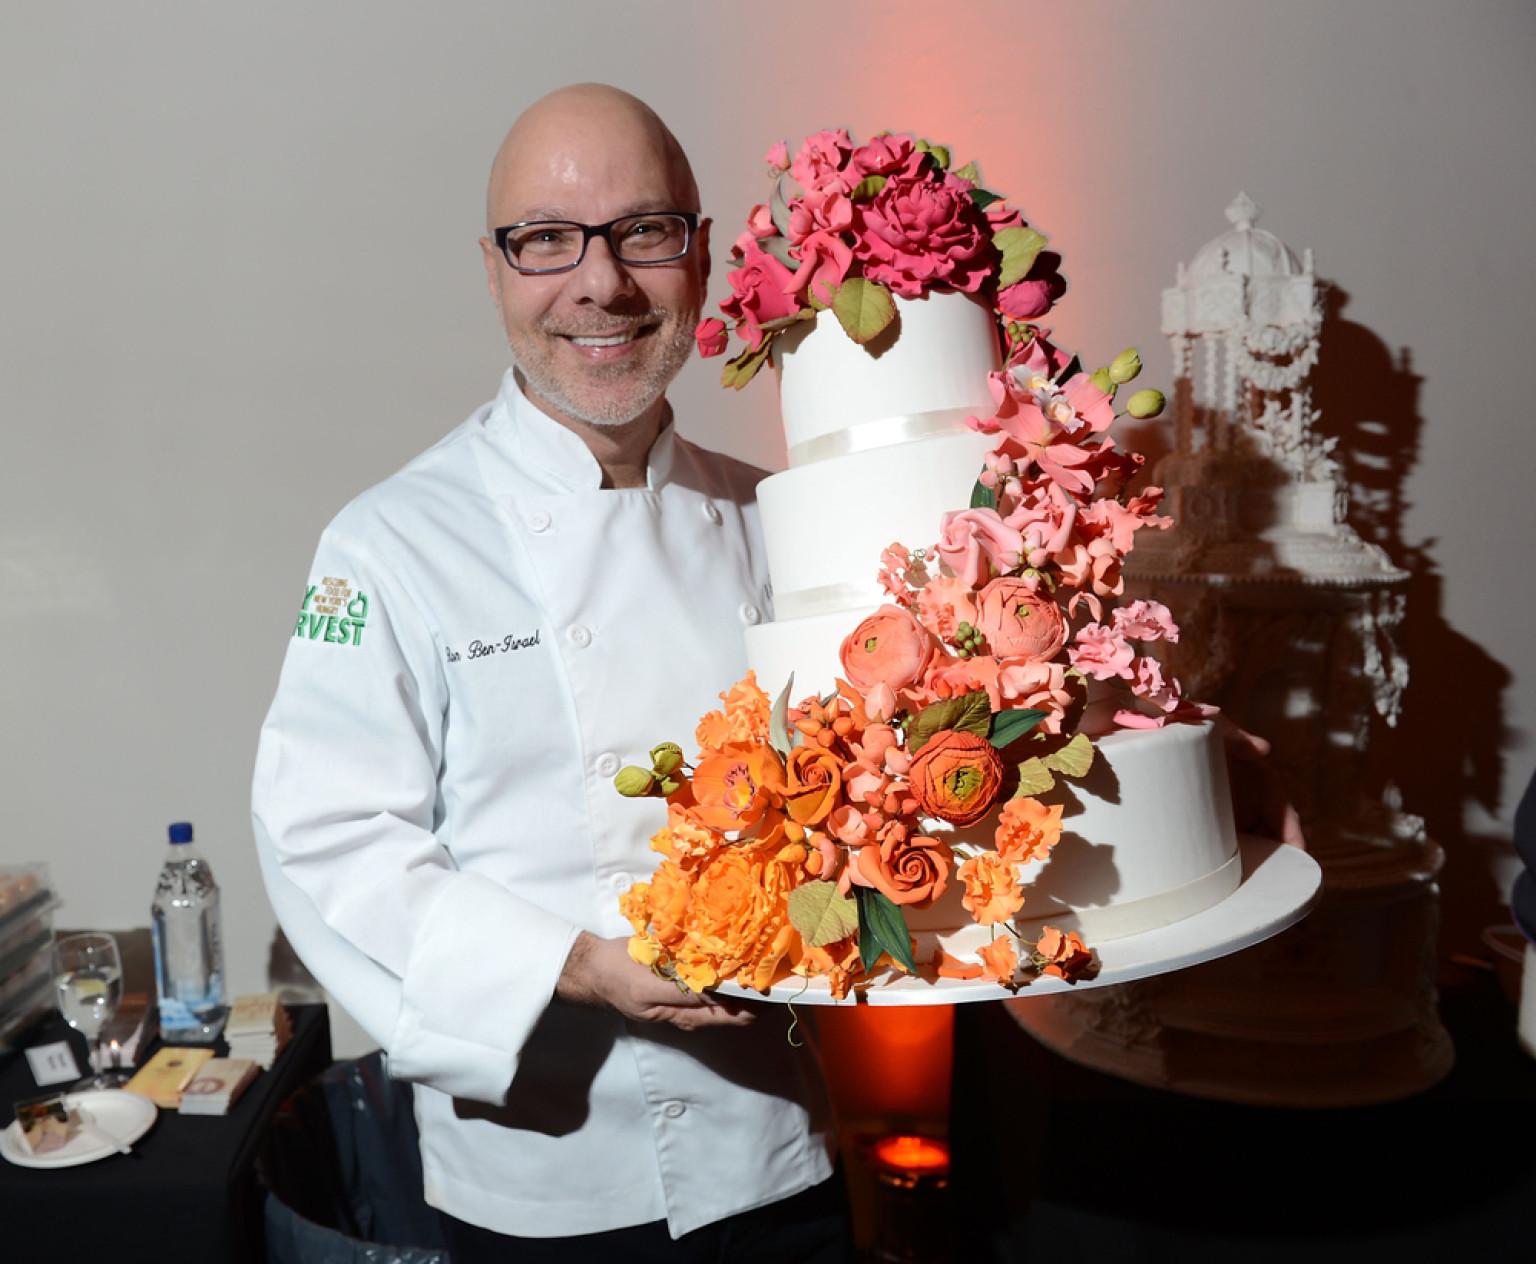 Diy Wedding Cake Ron Ben Israel Talks Cake With A Rookie